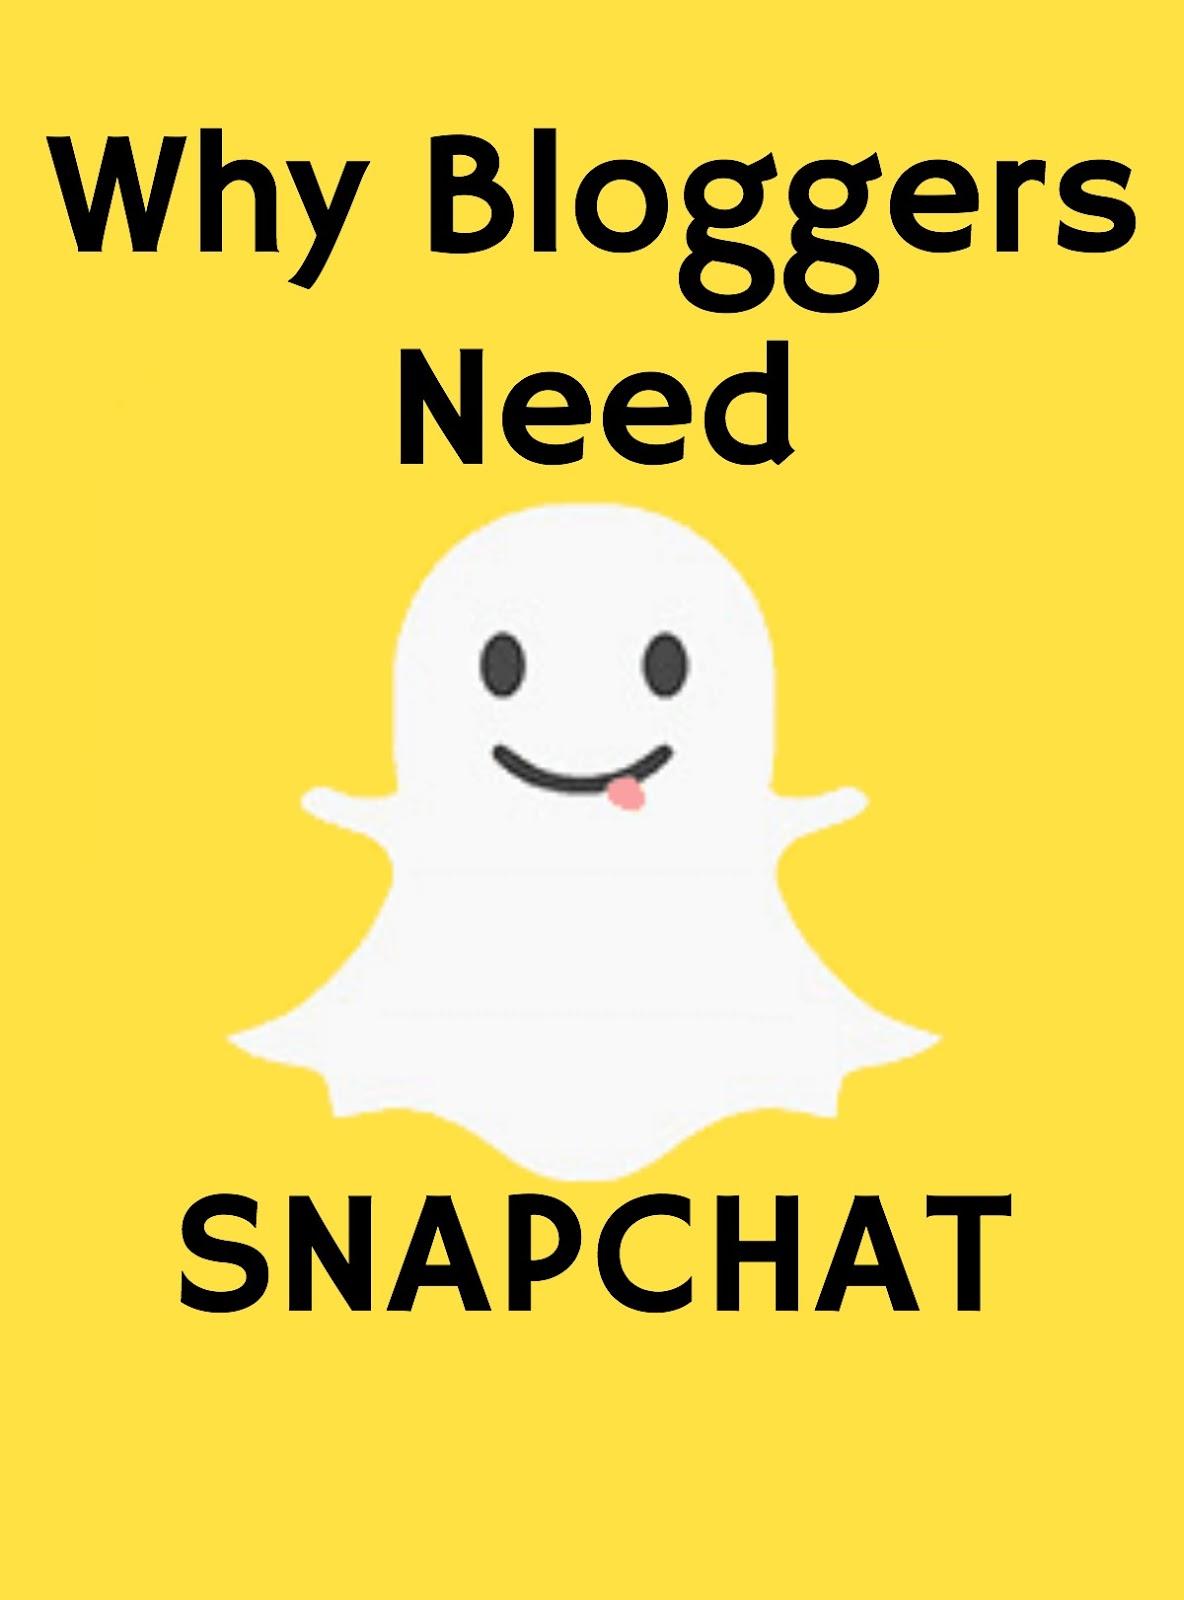 Why Bloggers Need Snapchat